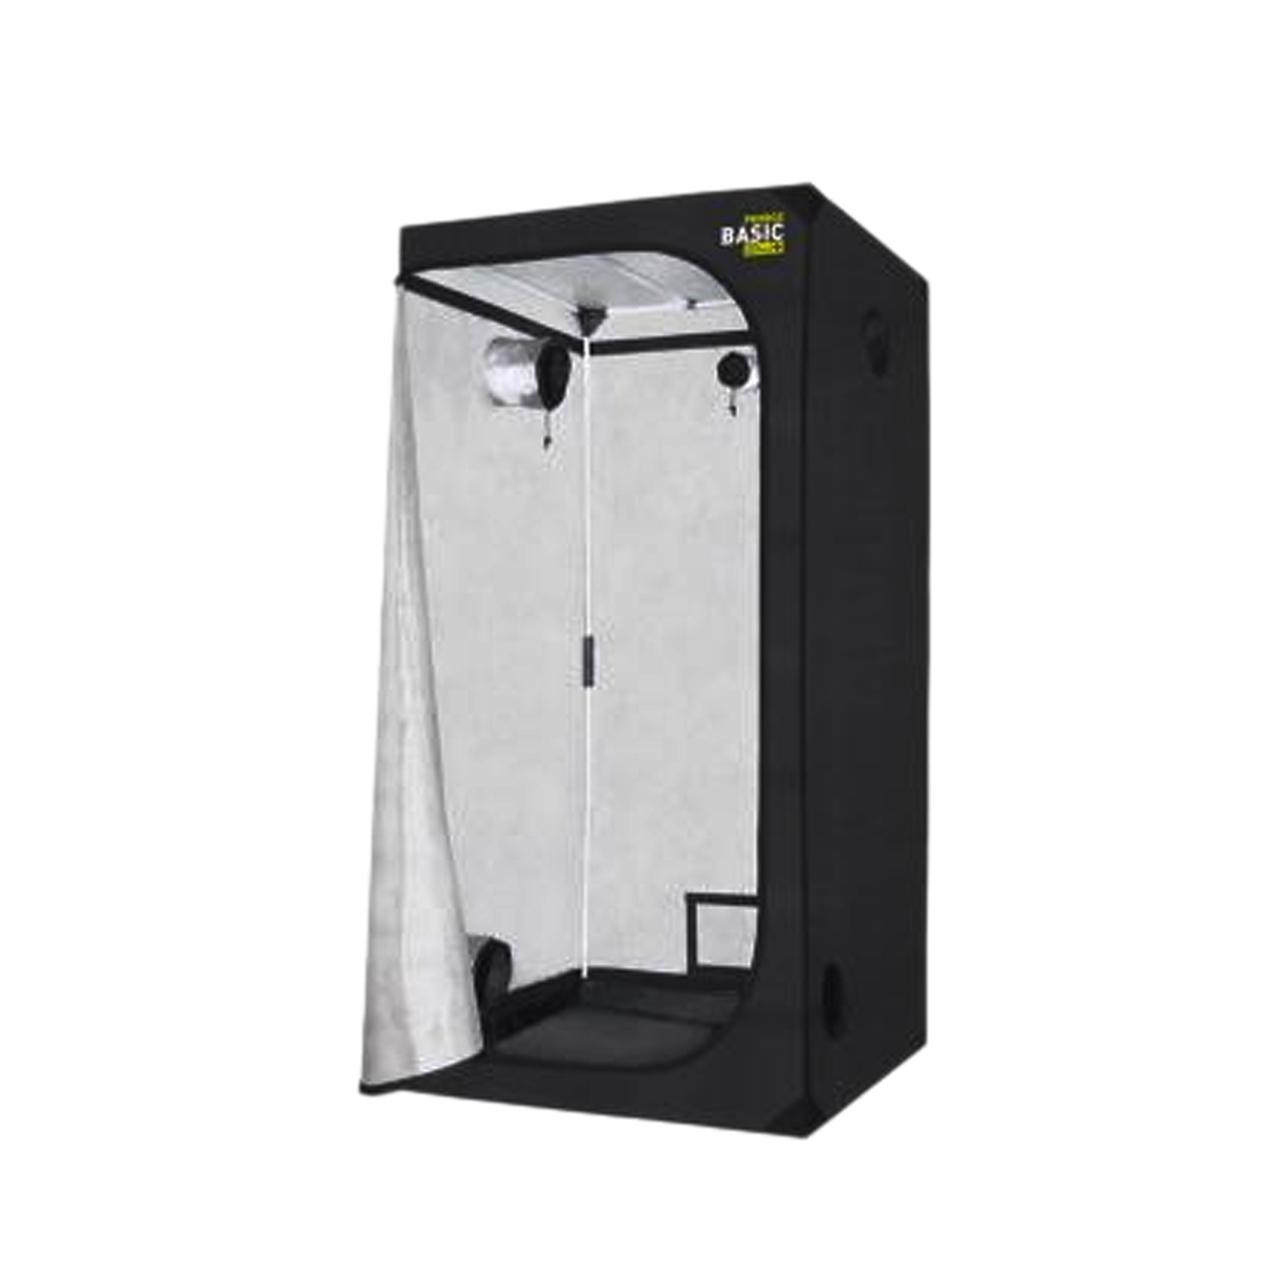 Estufa Pro Box Basic Pro 100 - 100x100x200 cm